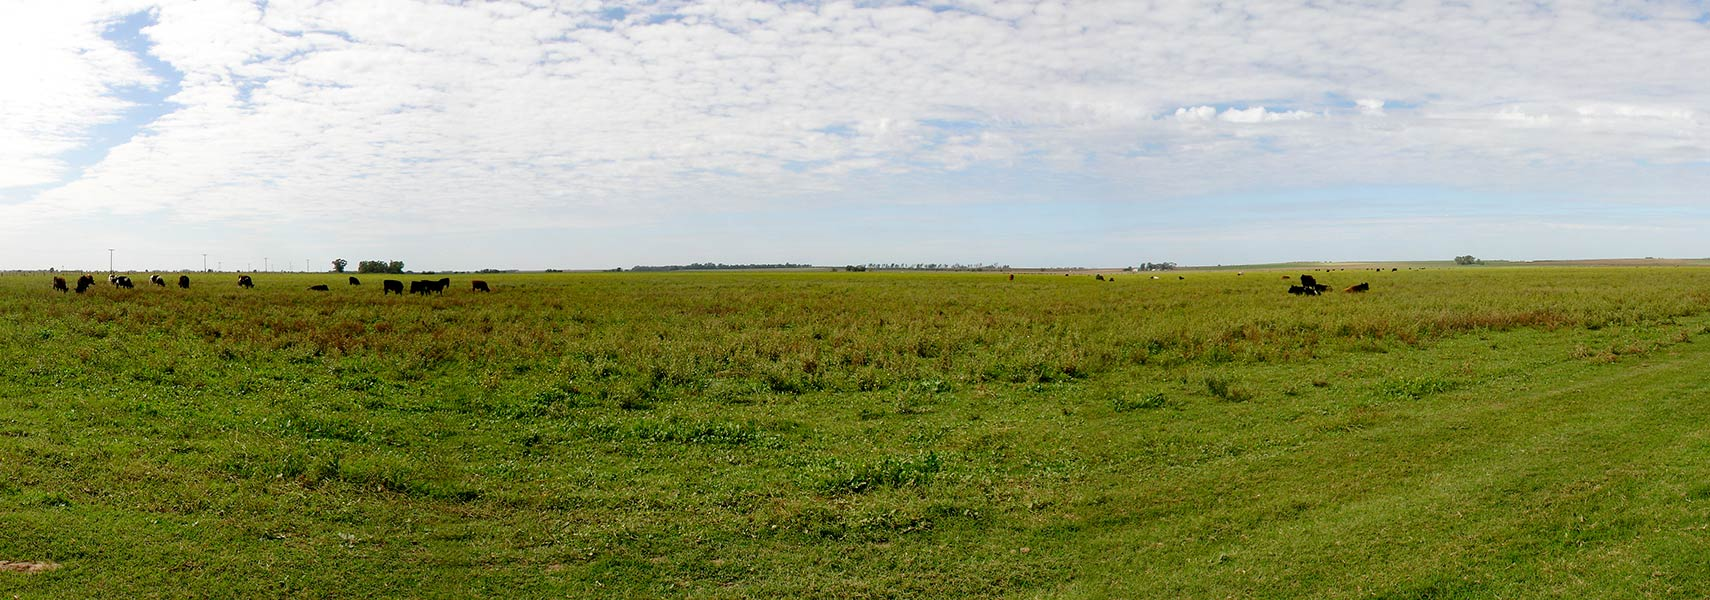 Grazing Land In Conhelo Department La Pampa Province Argentina Image Maximiliano Alba